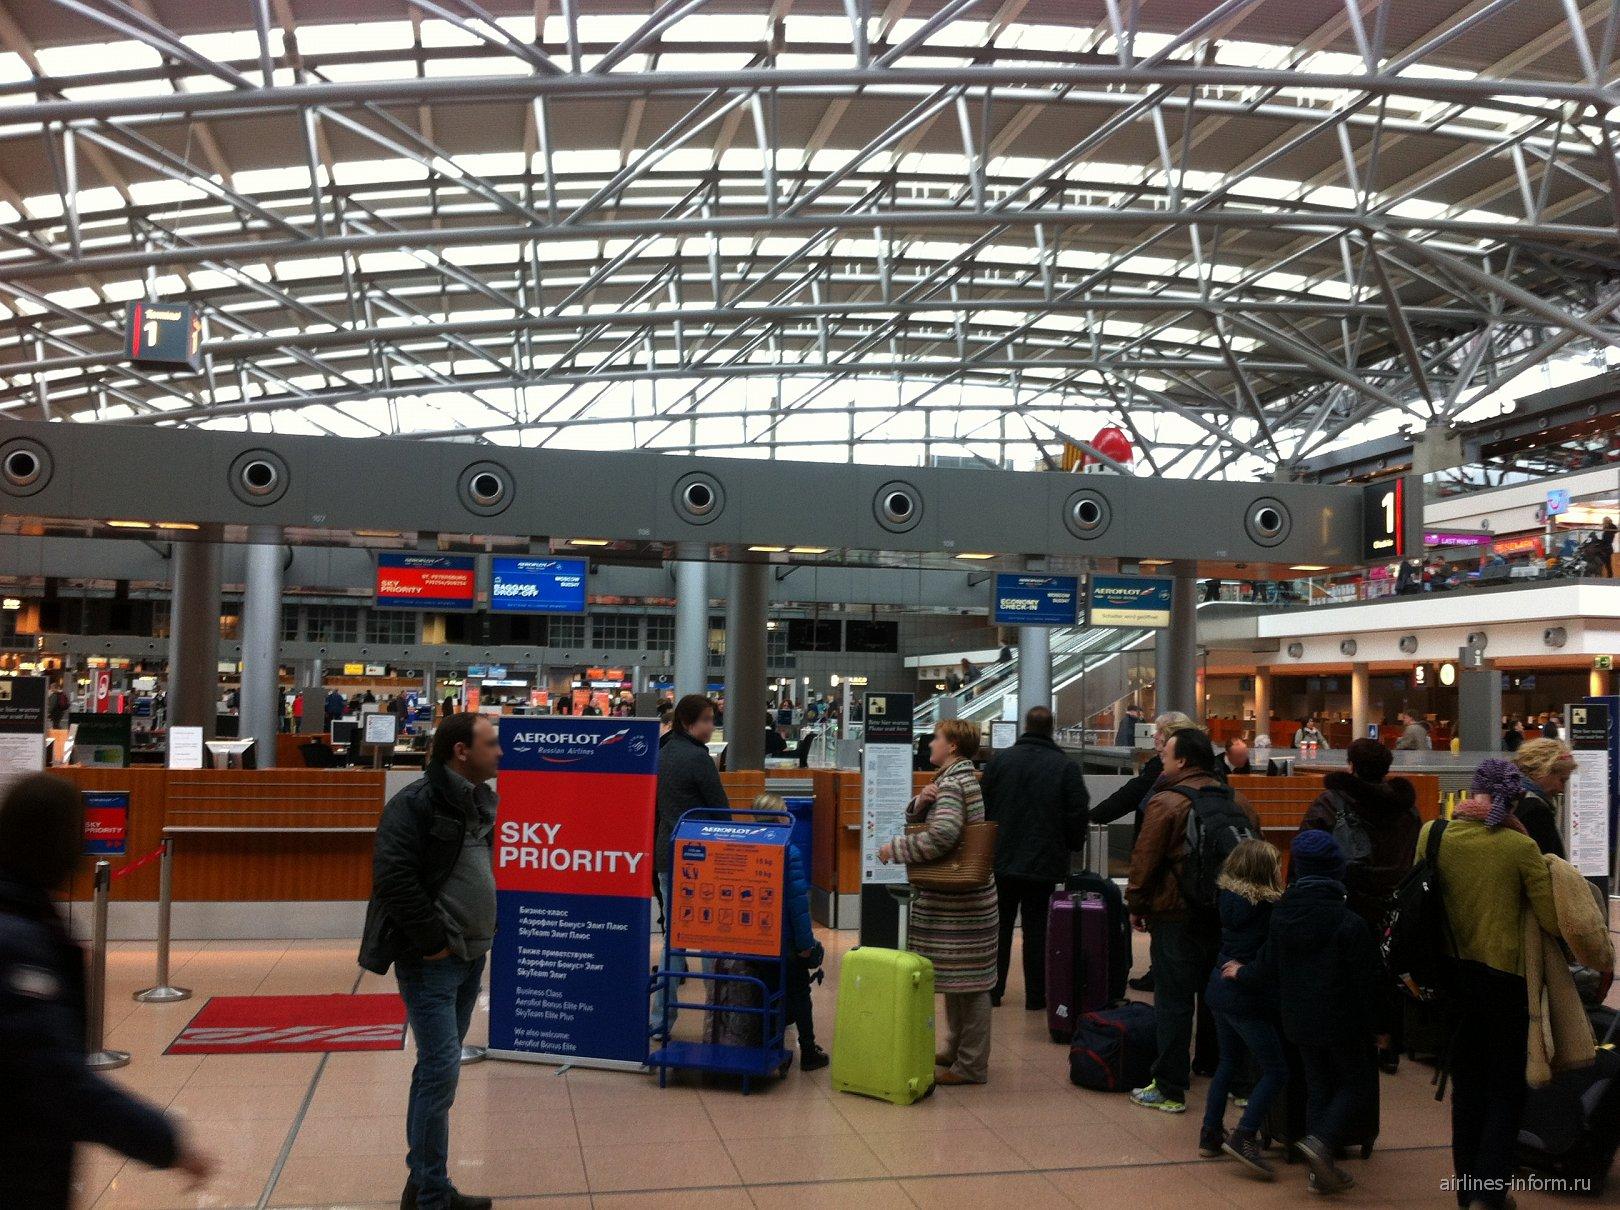 Стойки регистрации Аэрофлота в аэропорту Гамбург